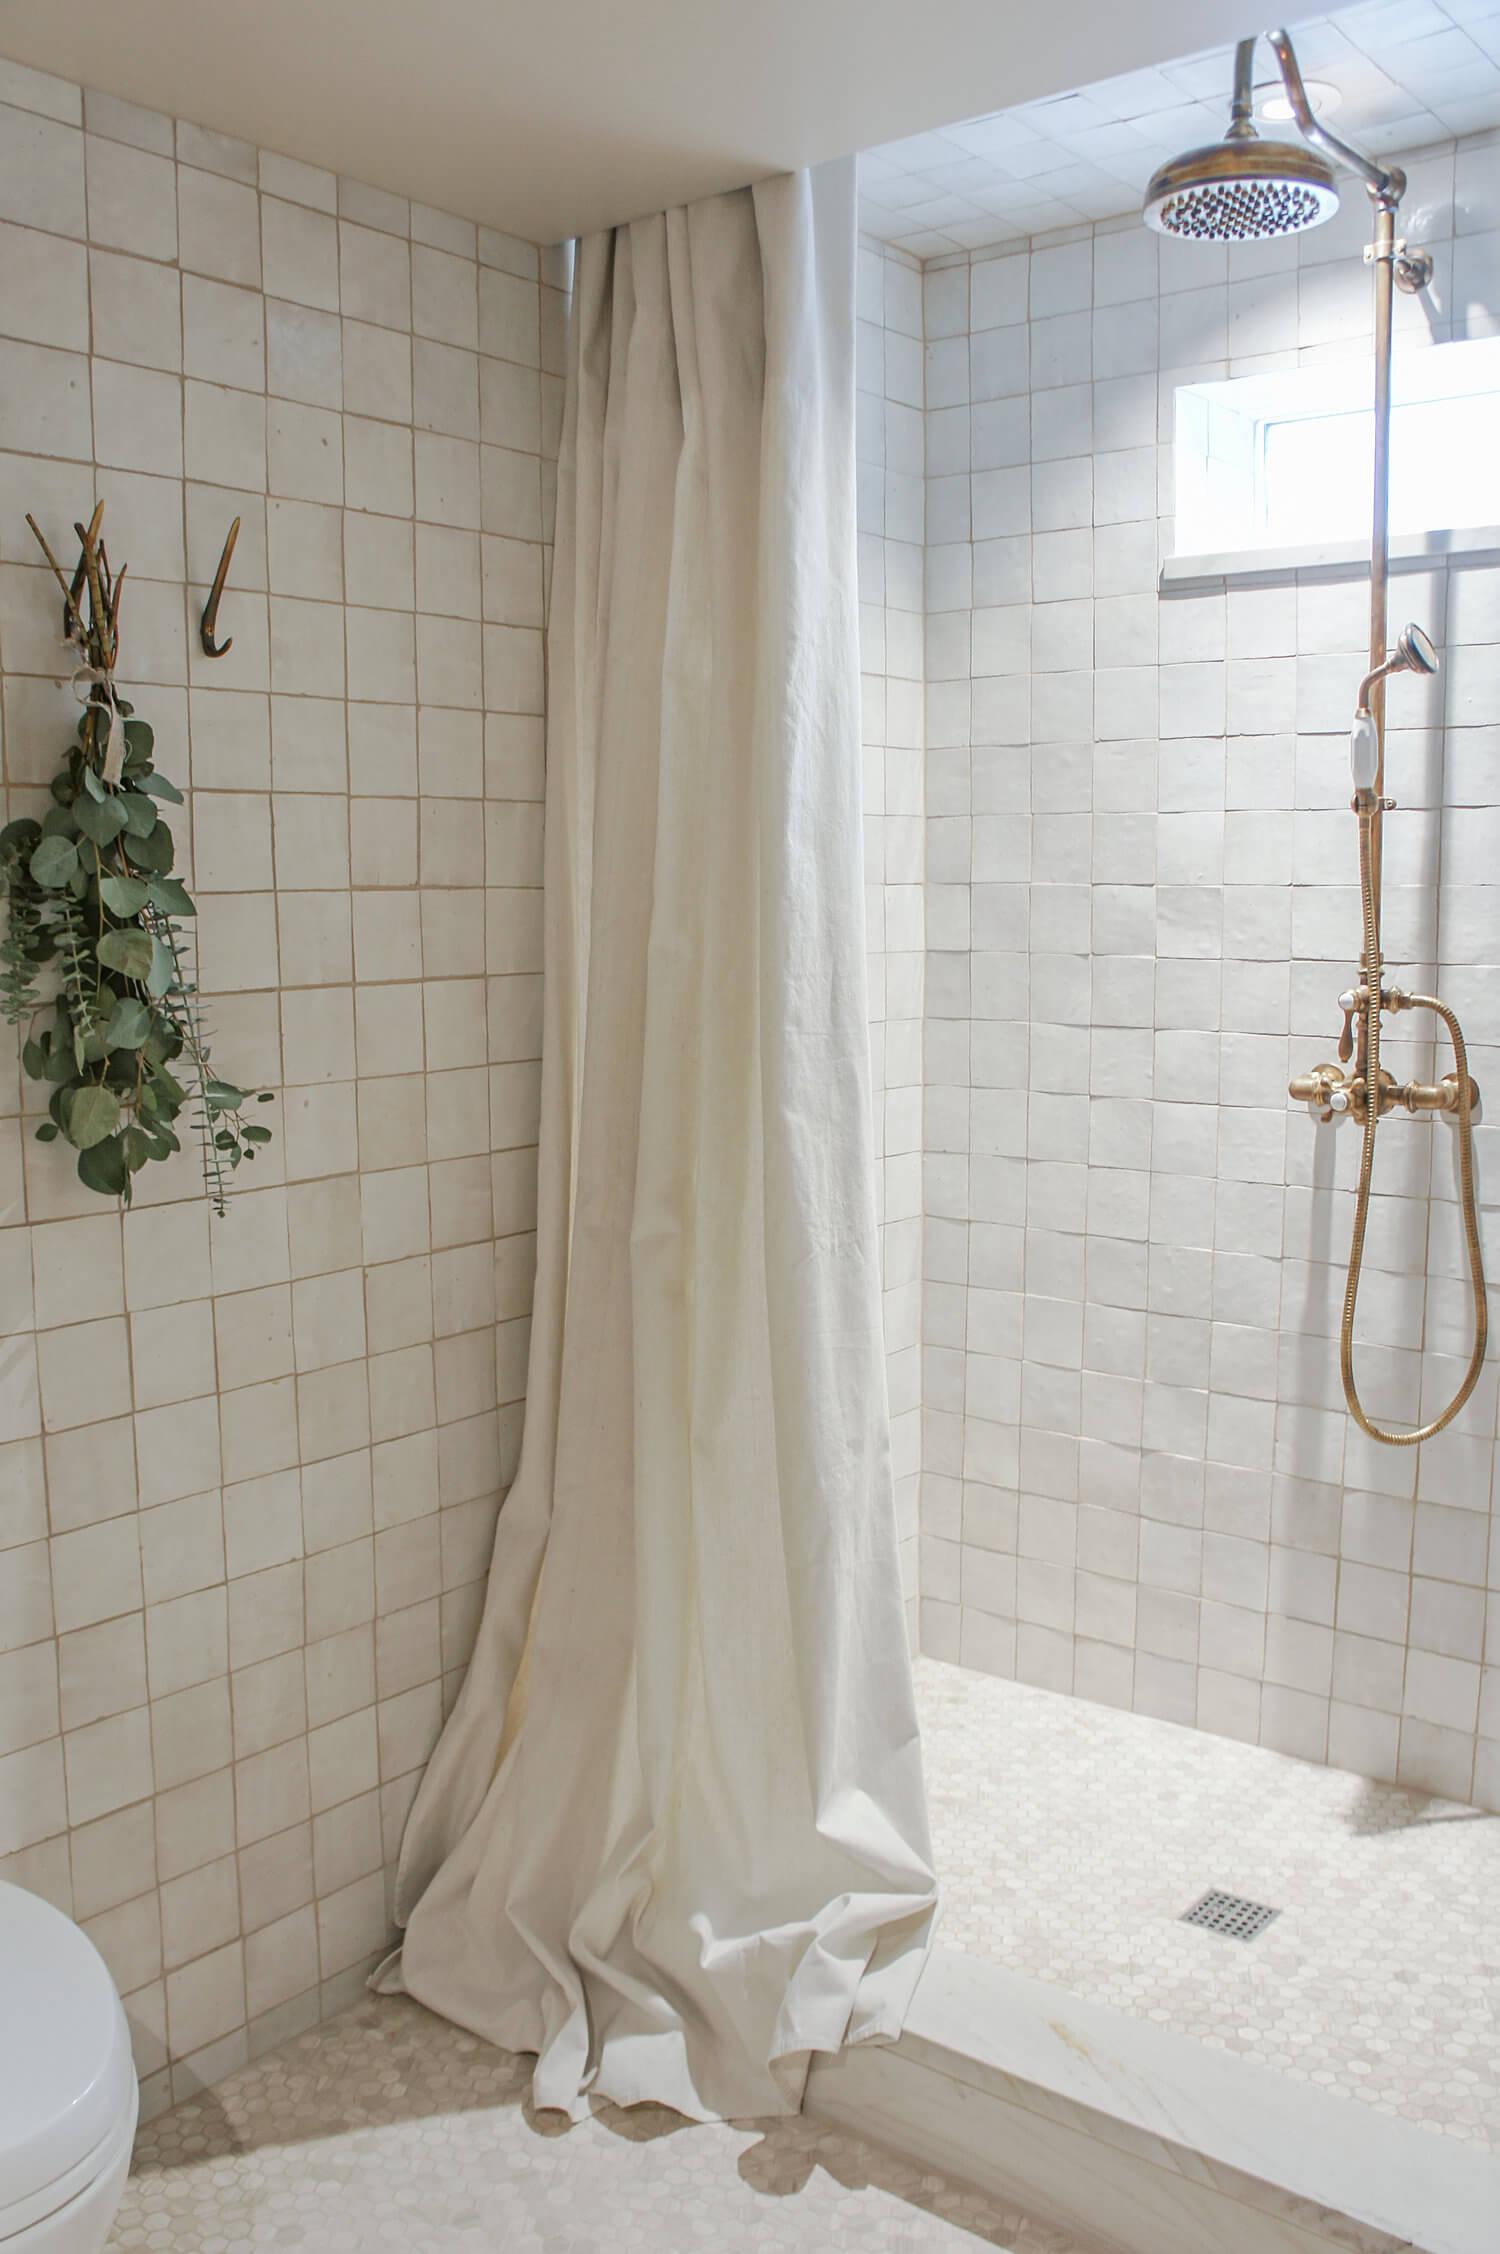 Une Salle De Bain Minimaliste Badezimmer Innenausstattung Zen